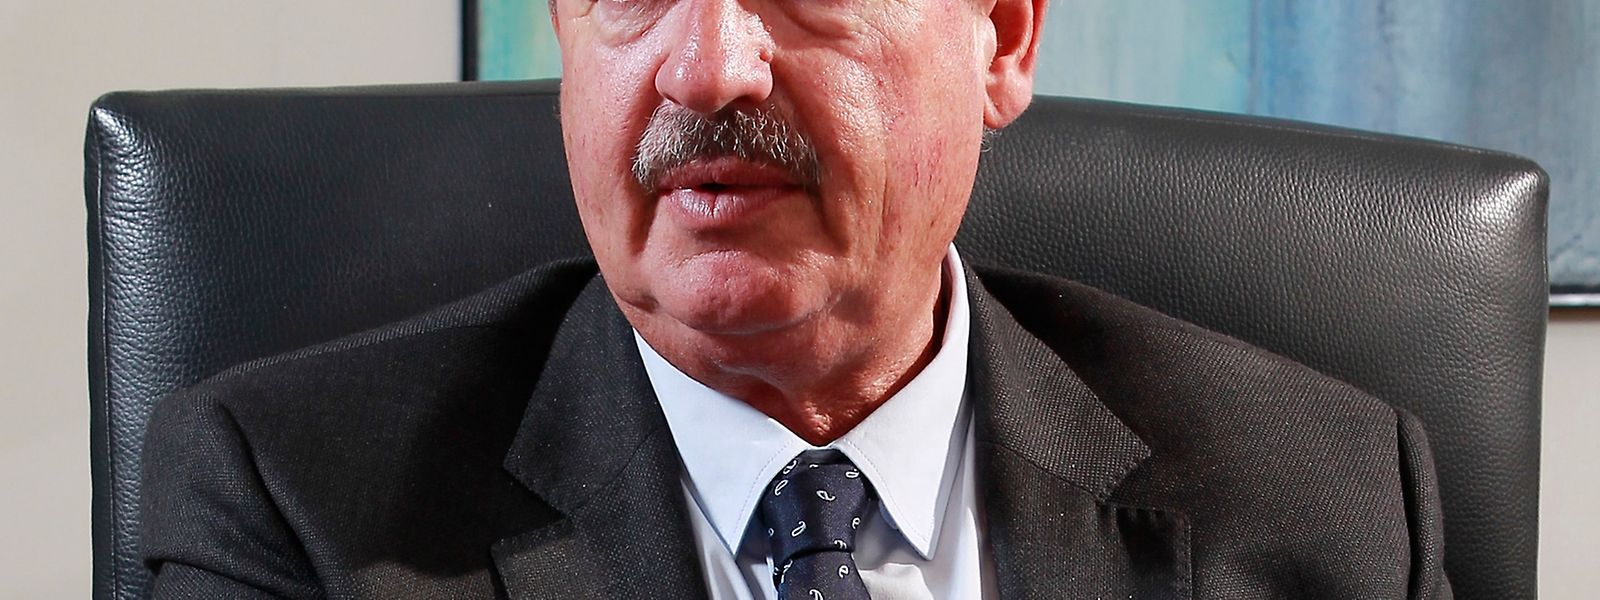 O ministro dos Negócios Estrangeiros do Luxemburgo, Jean Asselborn.